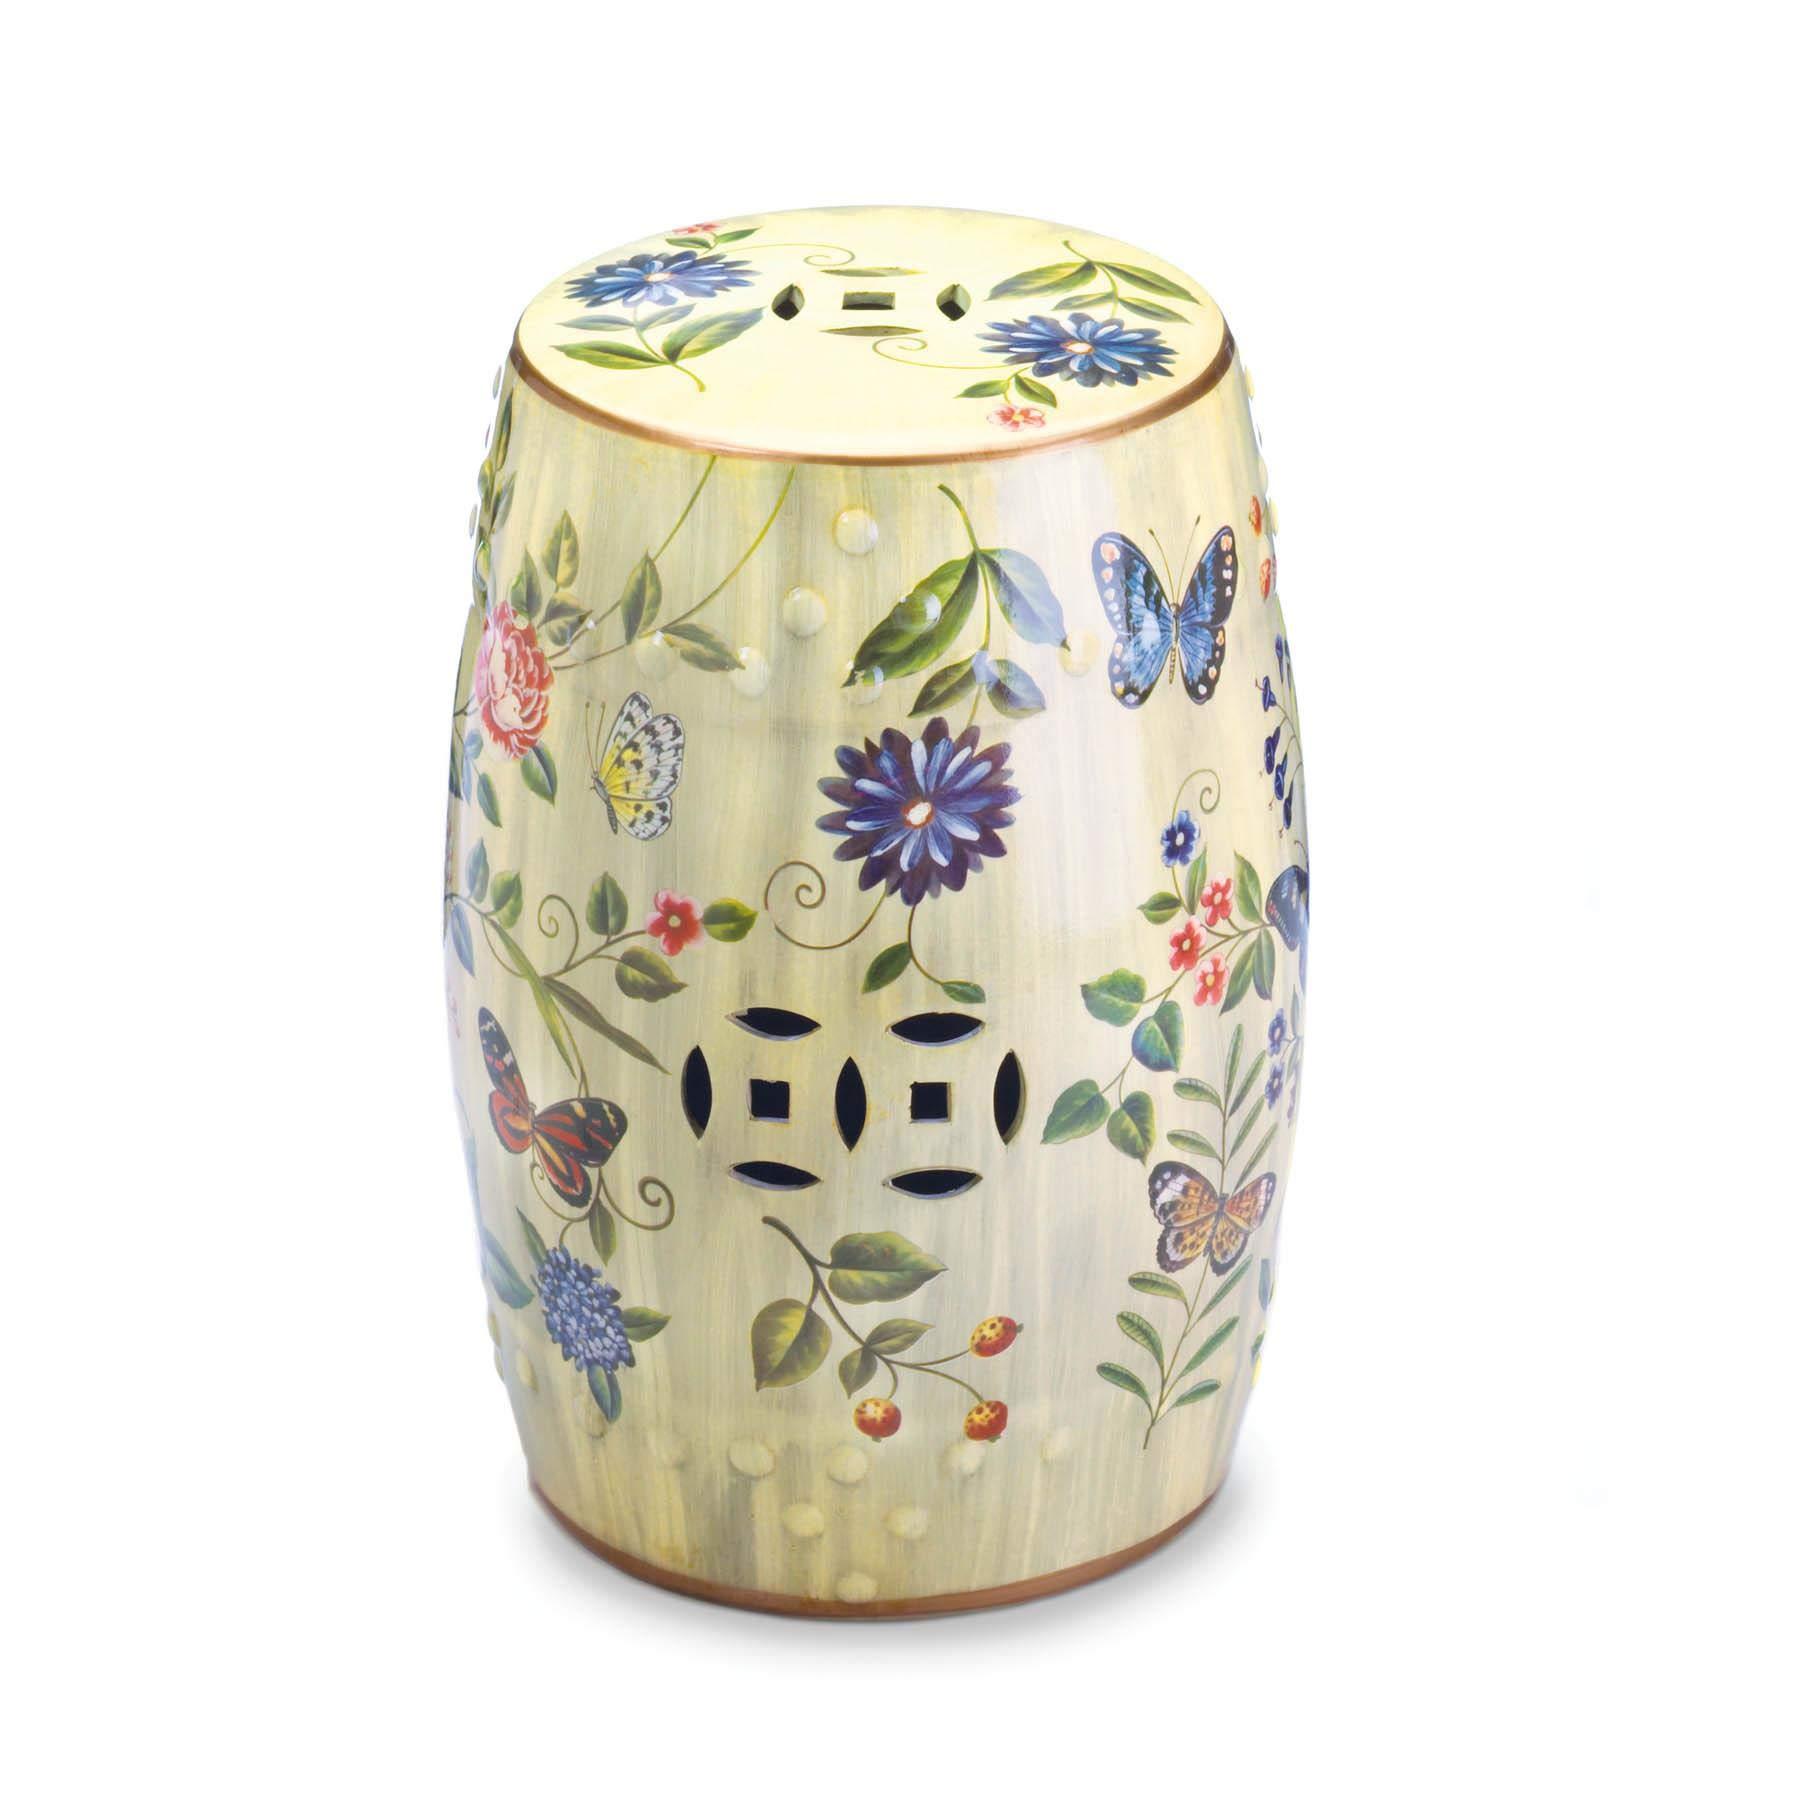 Smart Living Company 10017413 Butterfly Garden Ceramic Stool